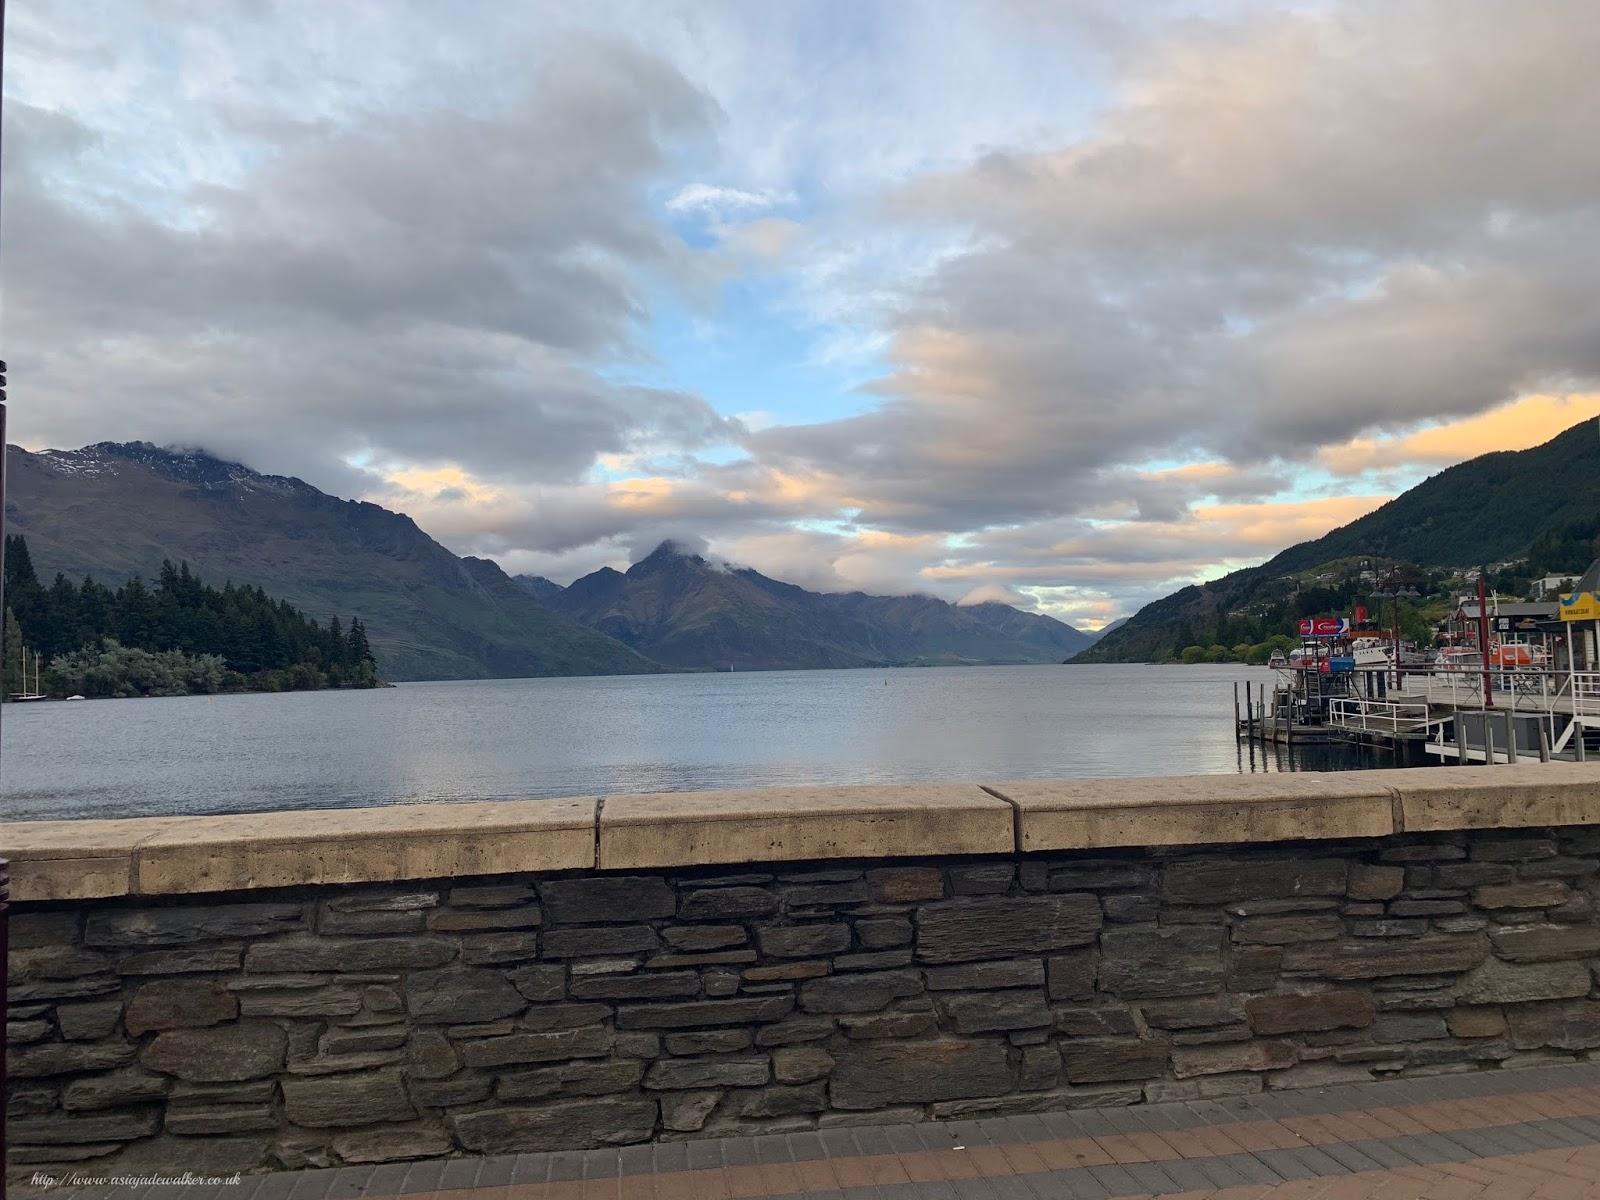 New Zealand 2018 | Part 4 – Queenstown Part 2 & Going Home